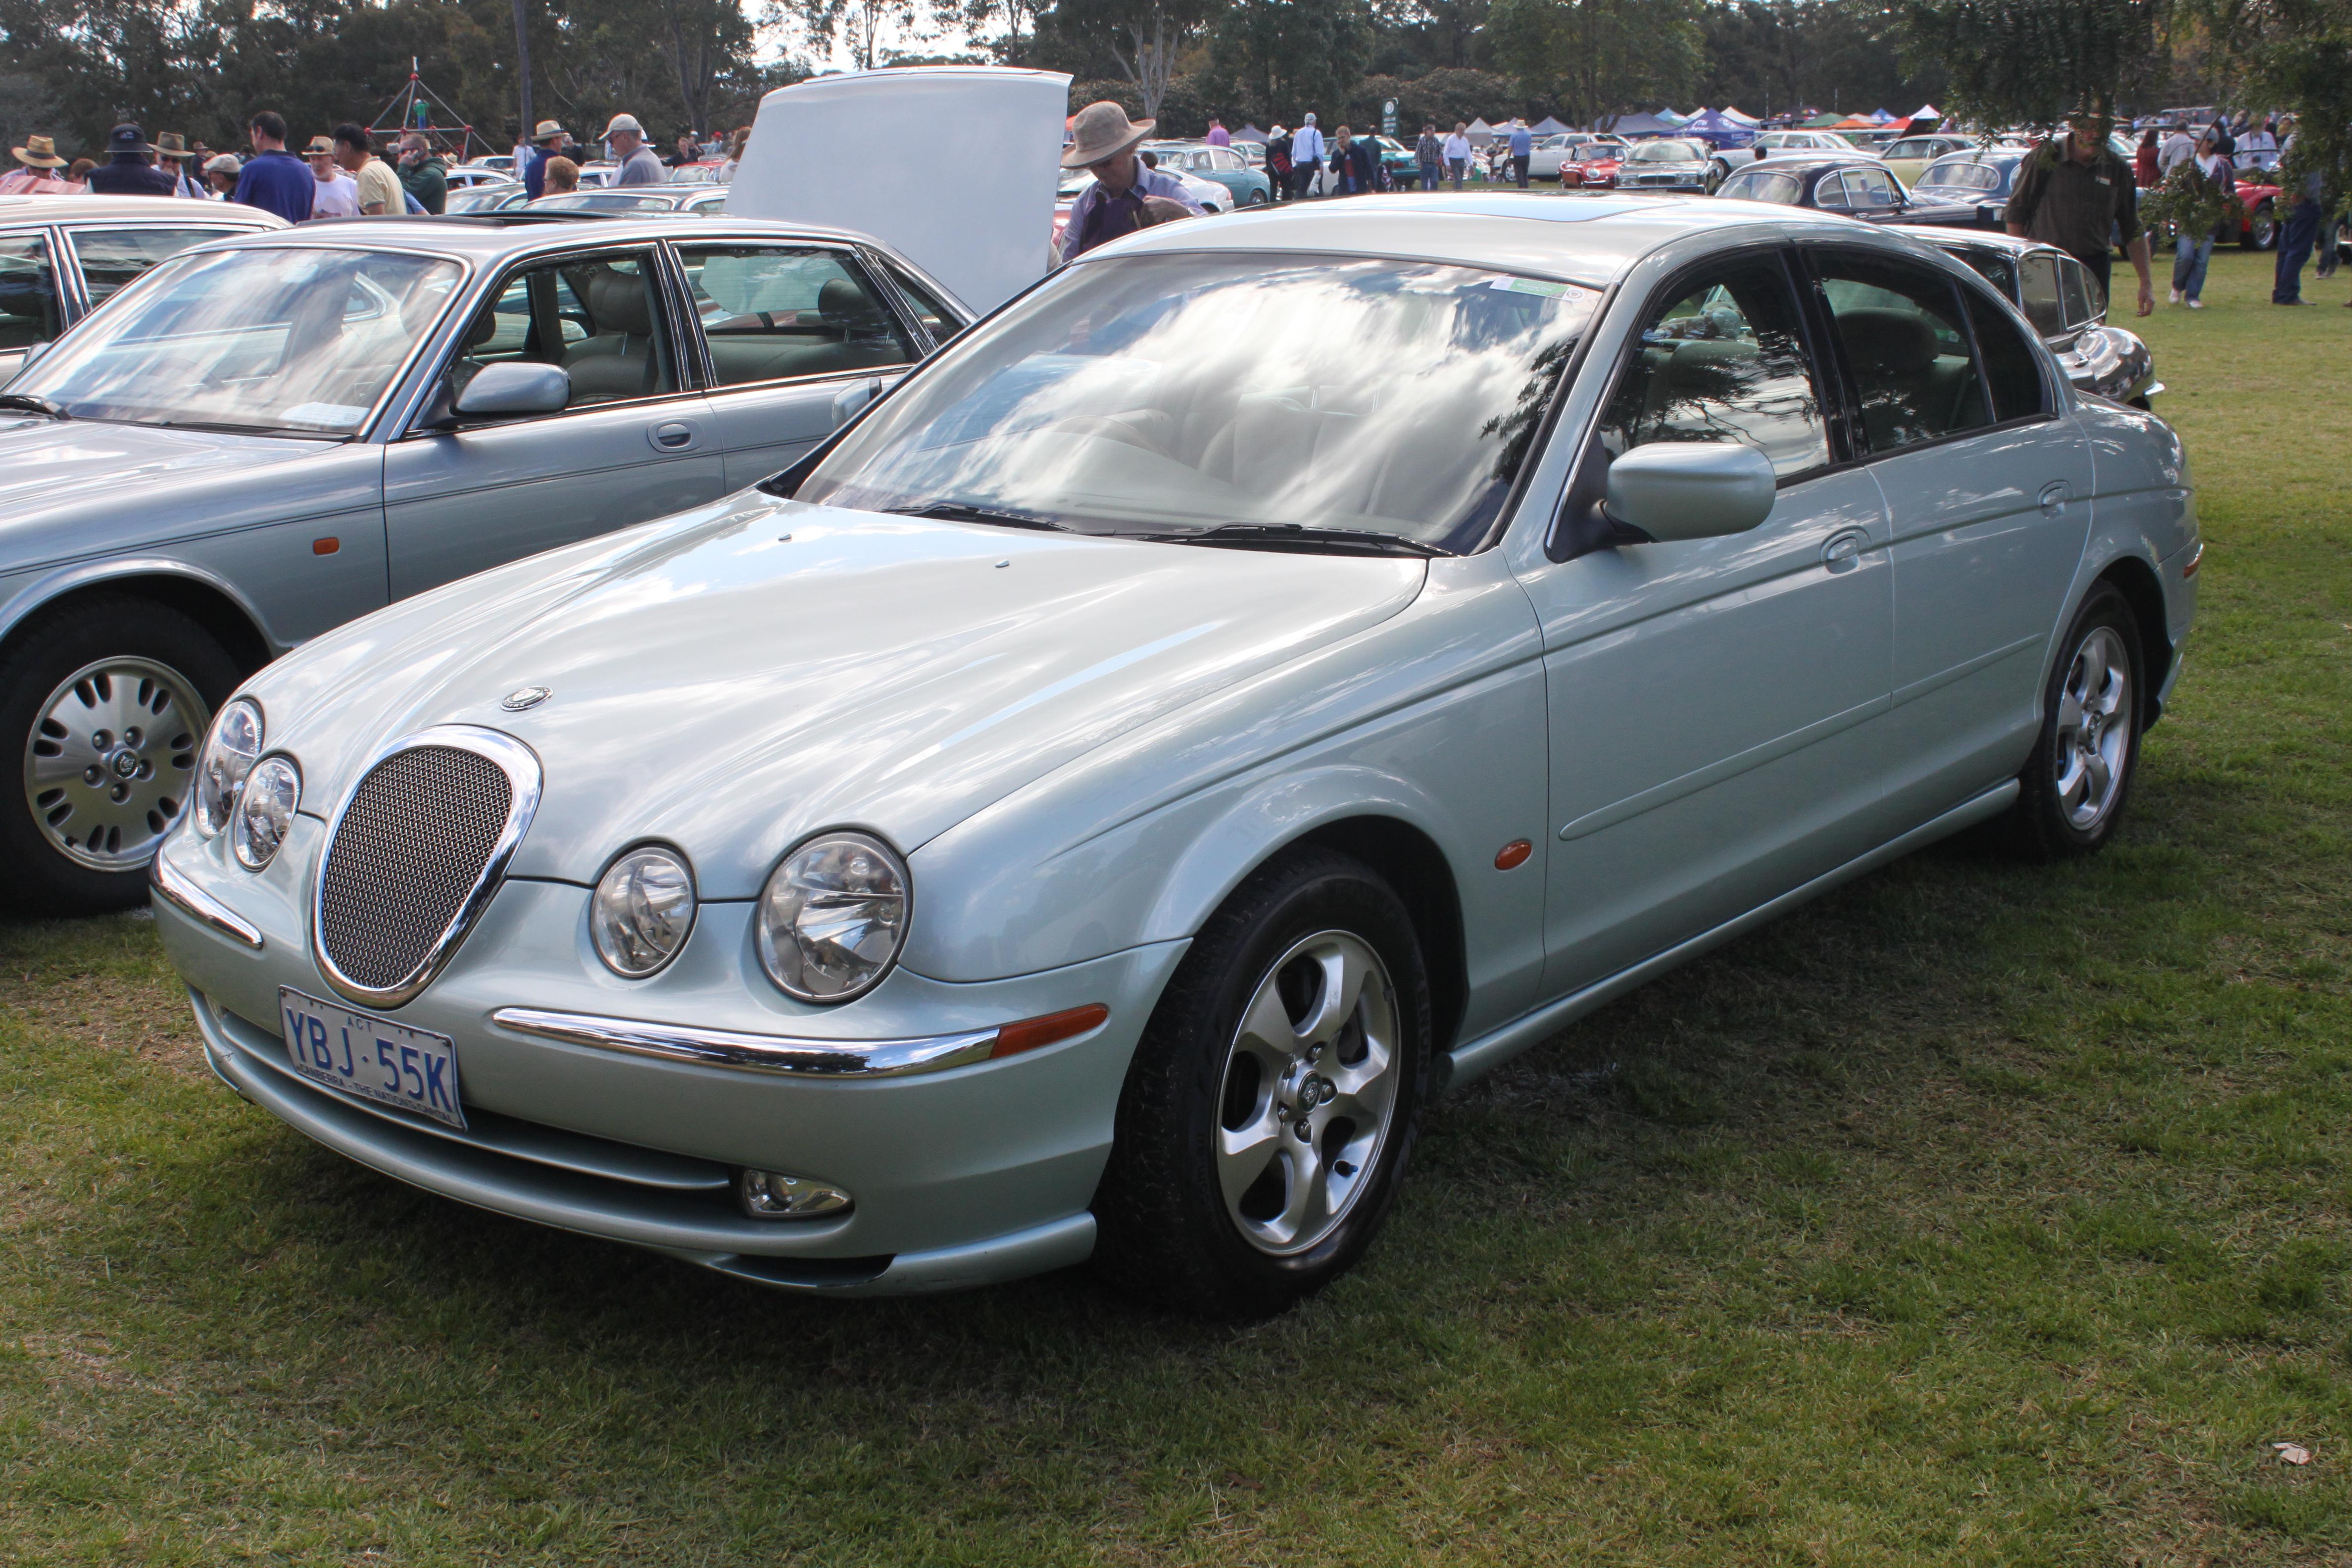 File:2000 Jaguar S Type (X200) SE 3.0 Sedan (21486737913)